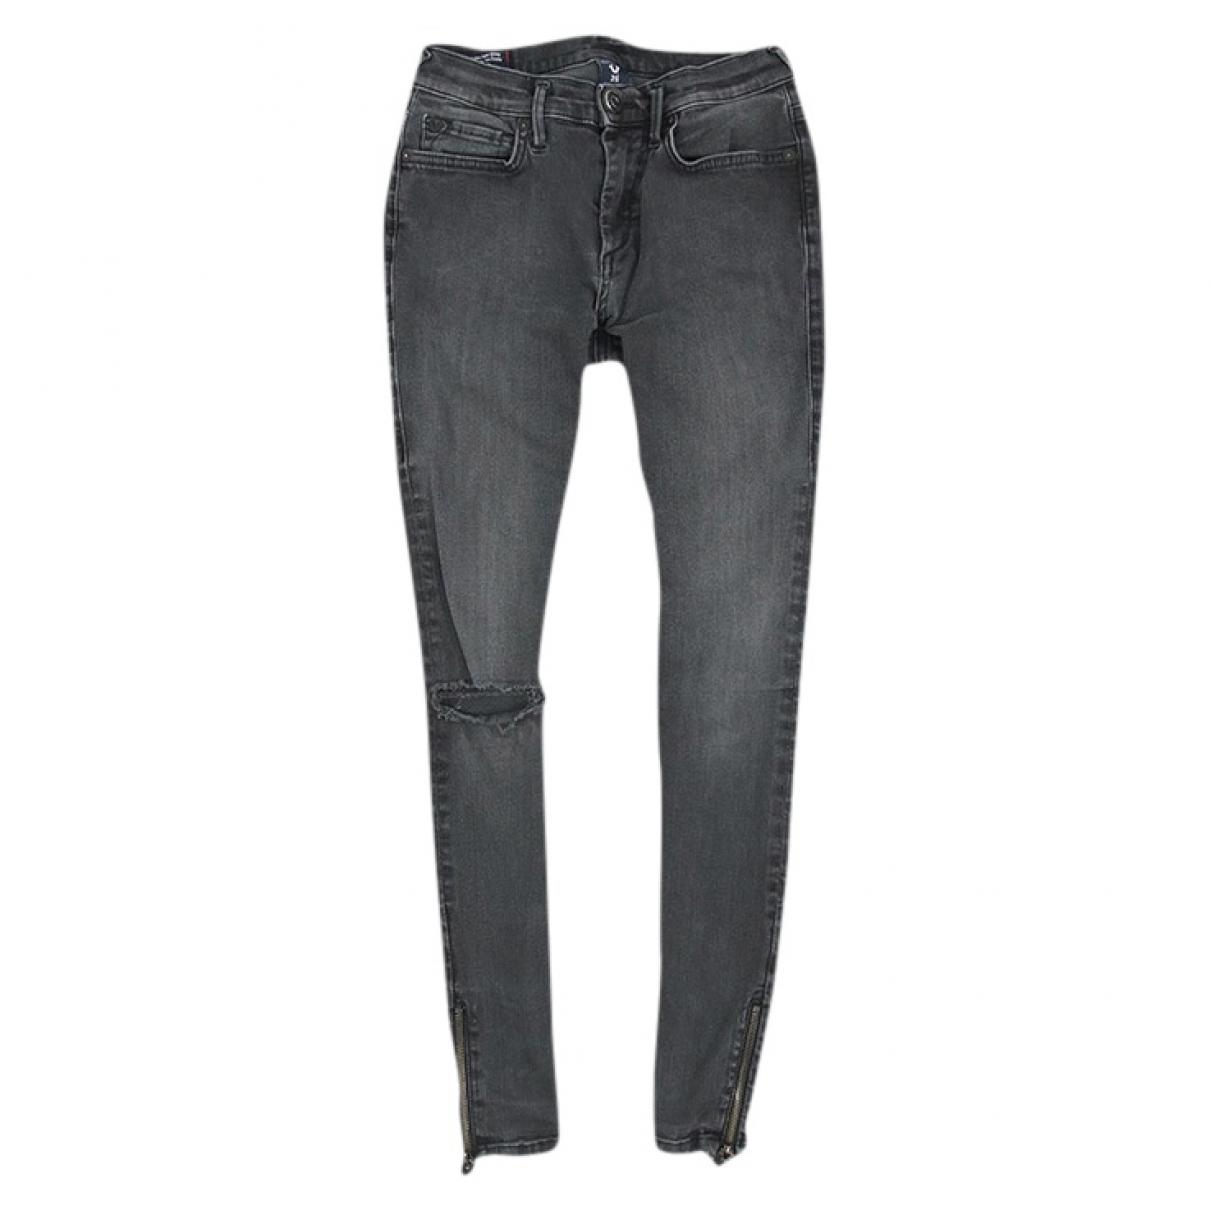 True Religion \N Black Cotton - elasthane Jeans for Women 25 US